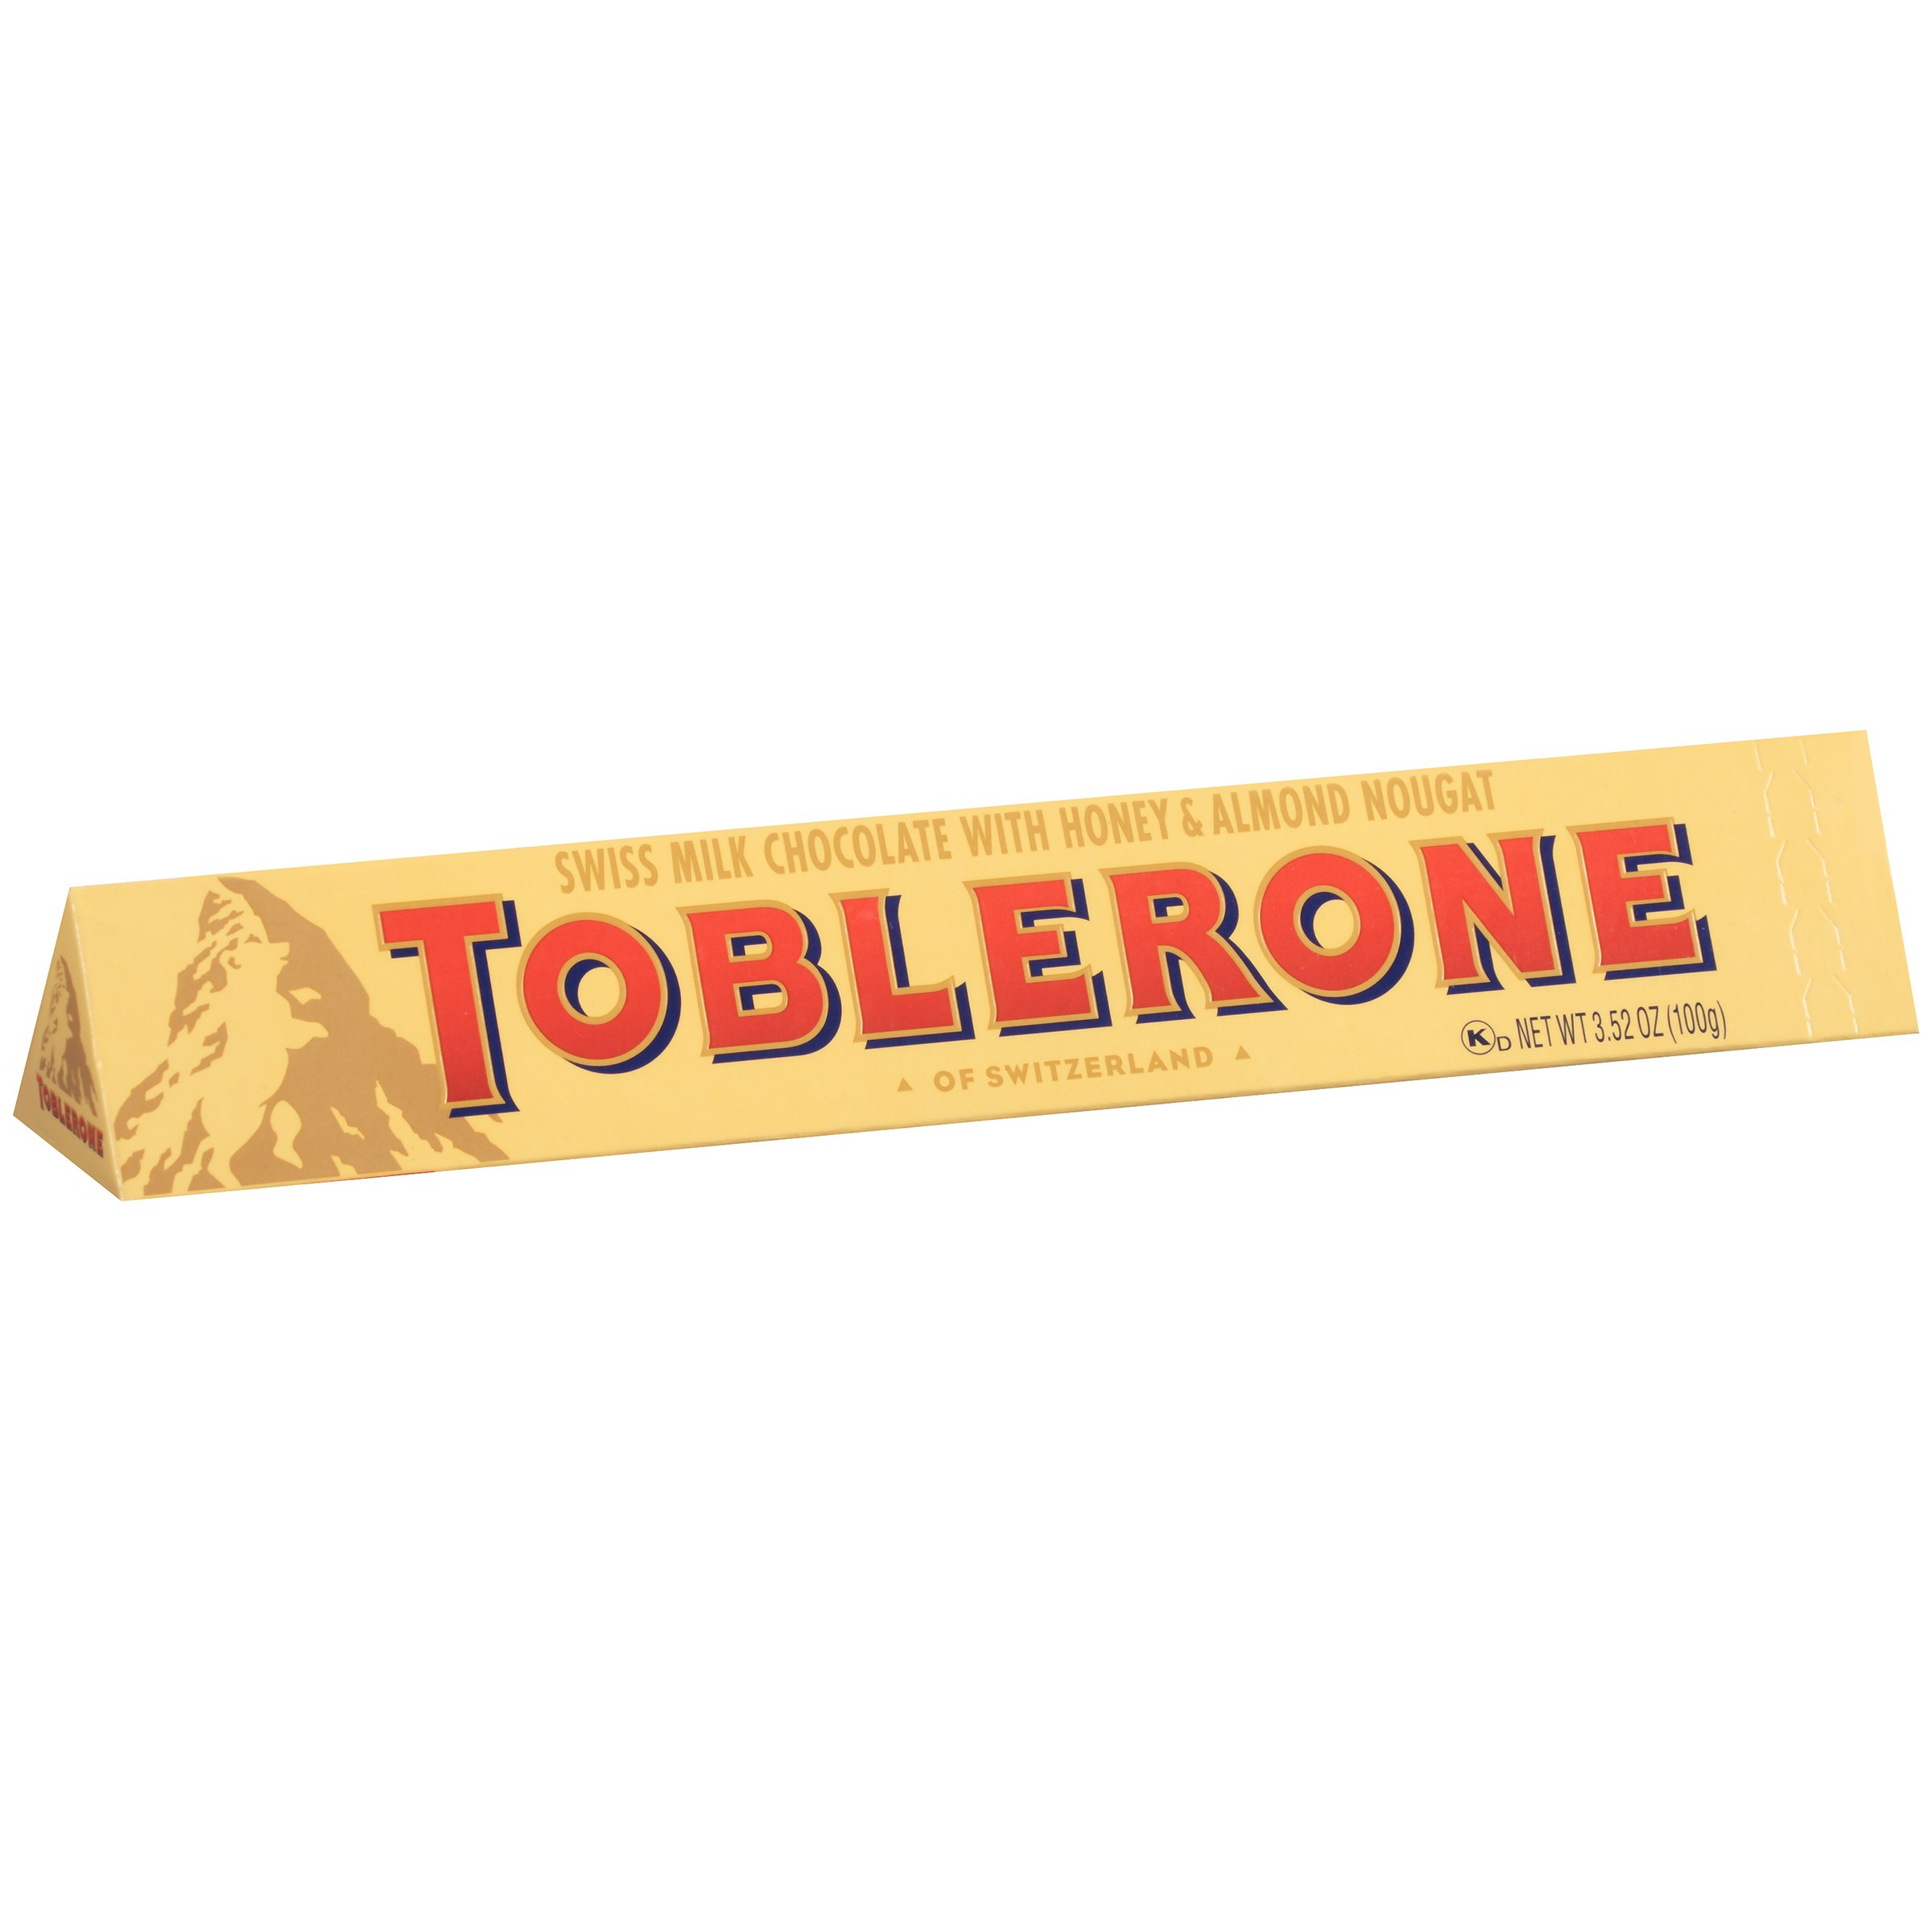 Toblerone Swiss Milk Chocolate Bar, 3.52-Ounce